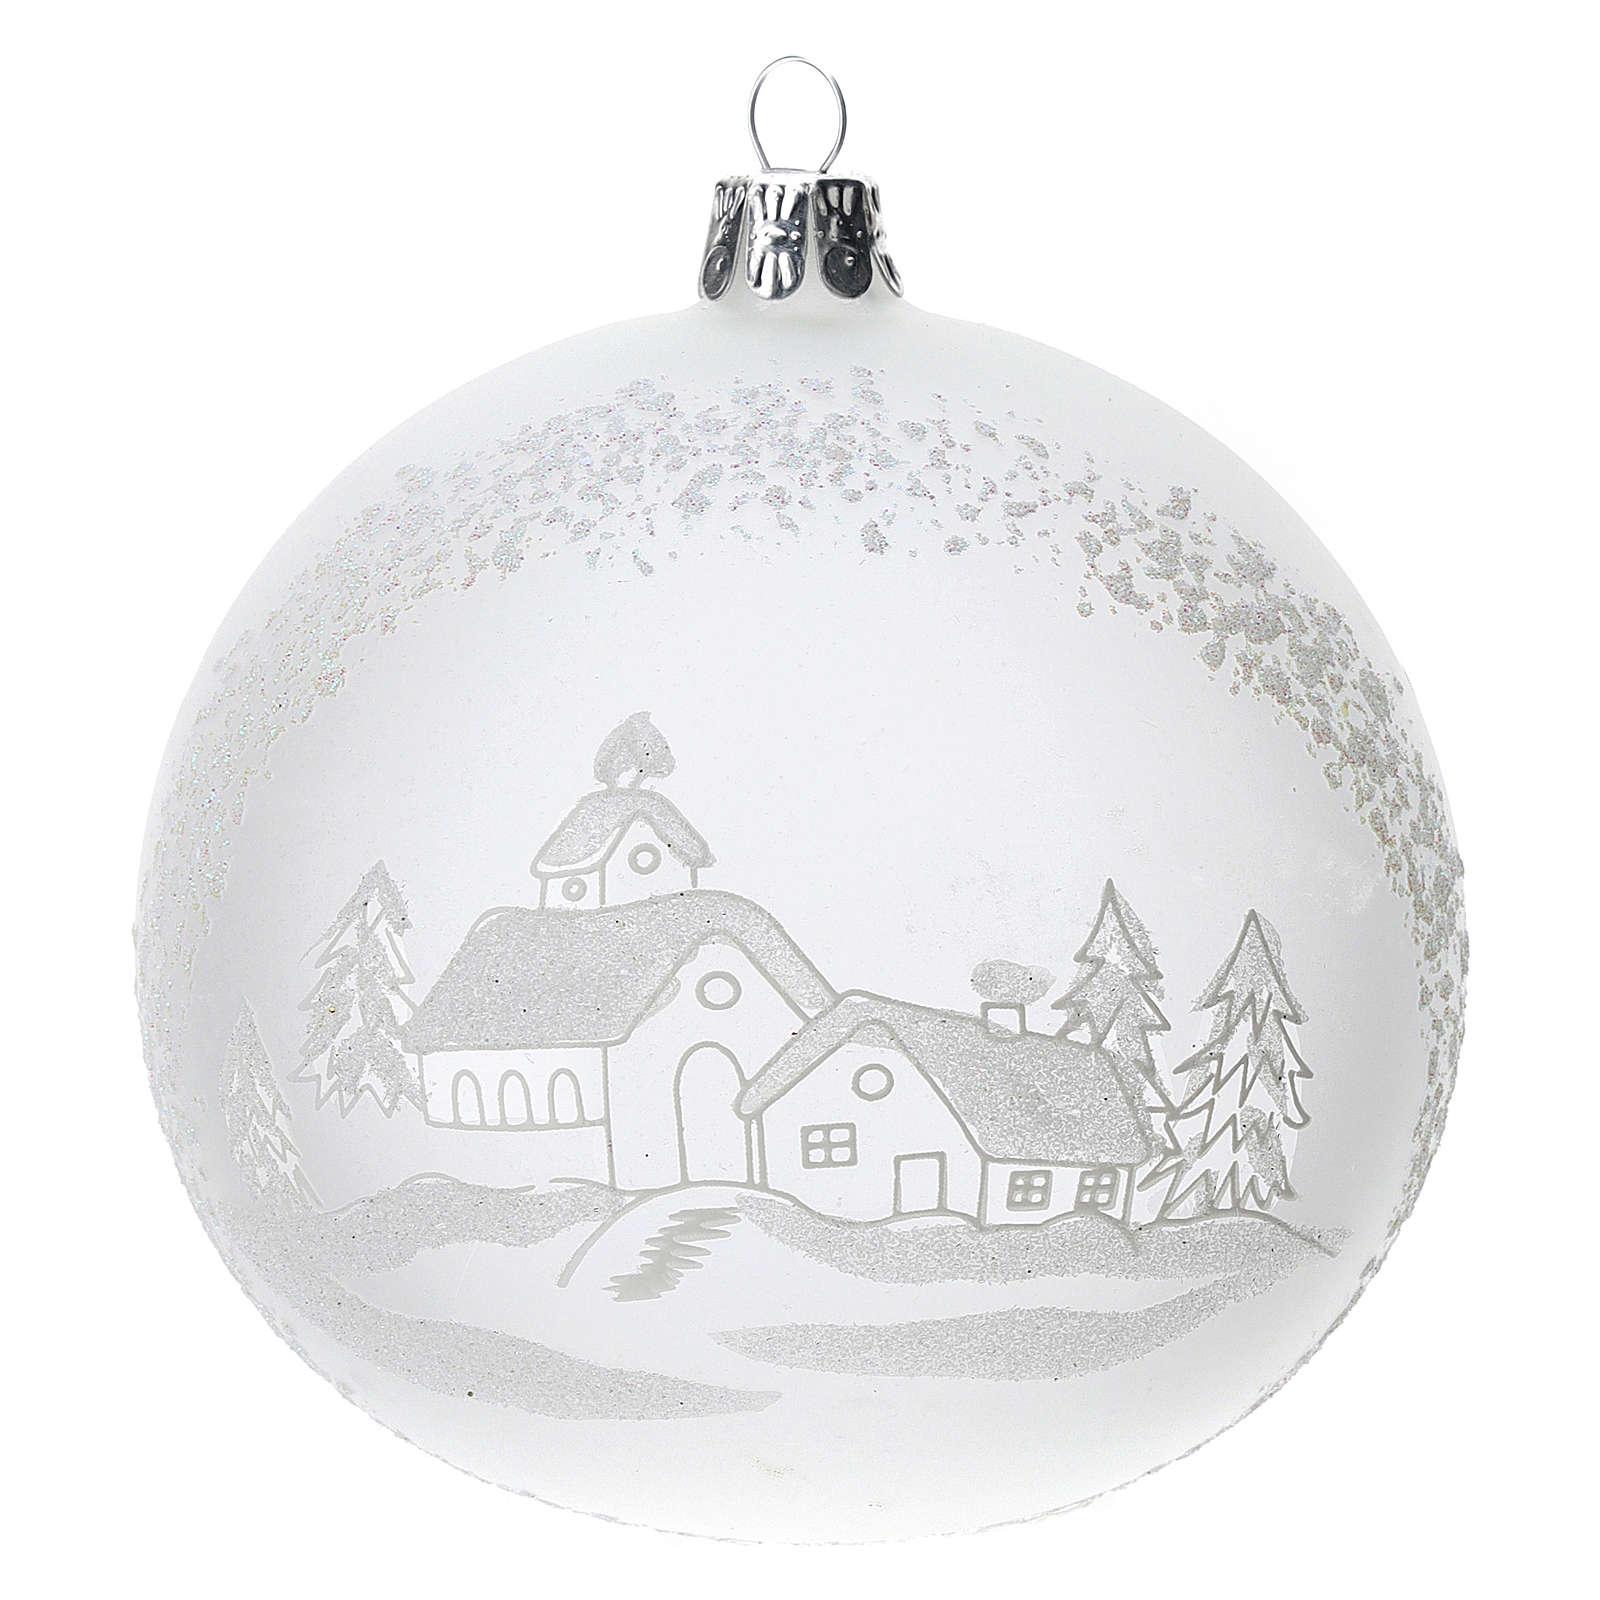 Bola árbol Navidad vidrio soplado opaca paisaje nevado 100 mm 4